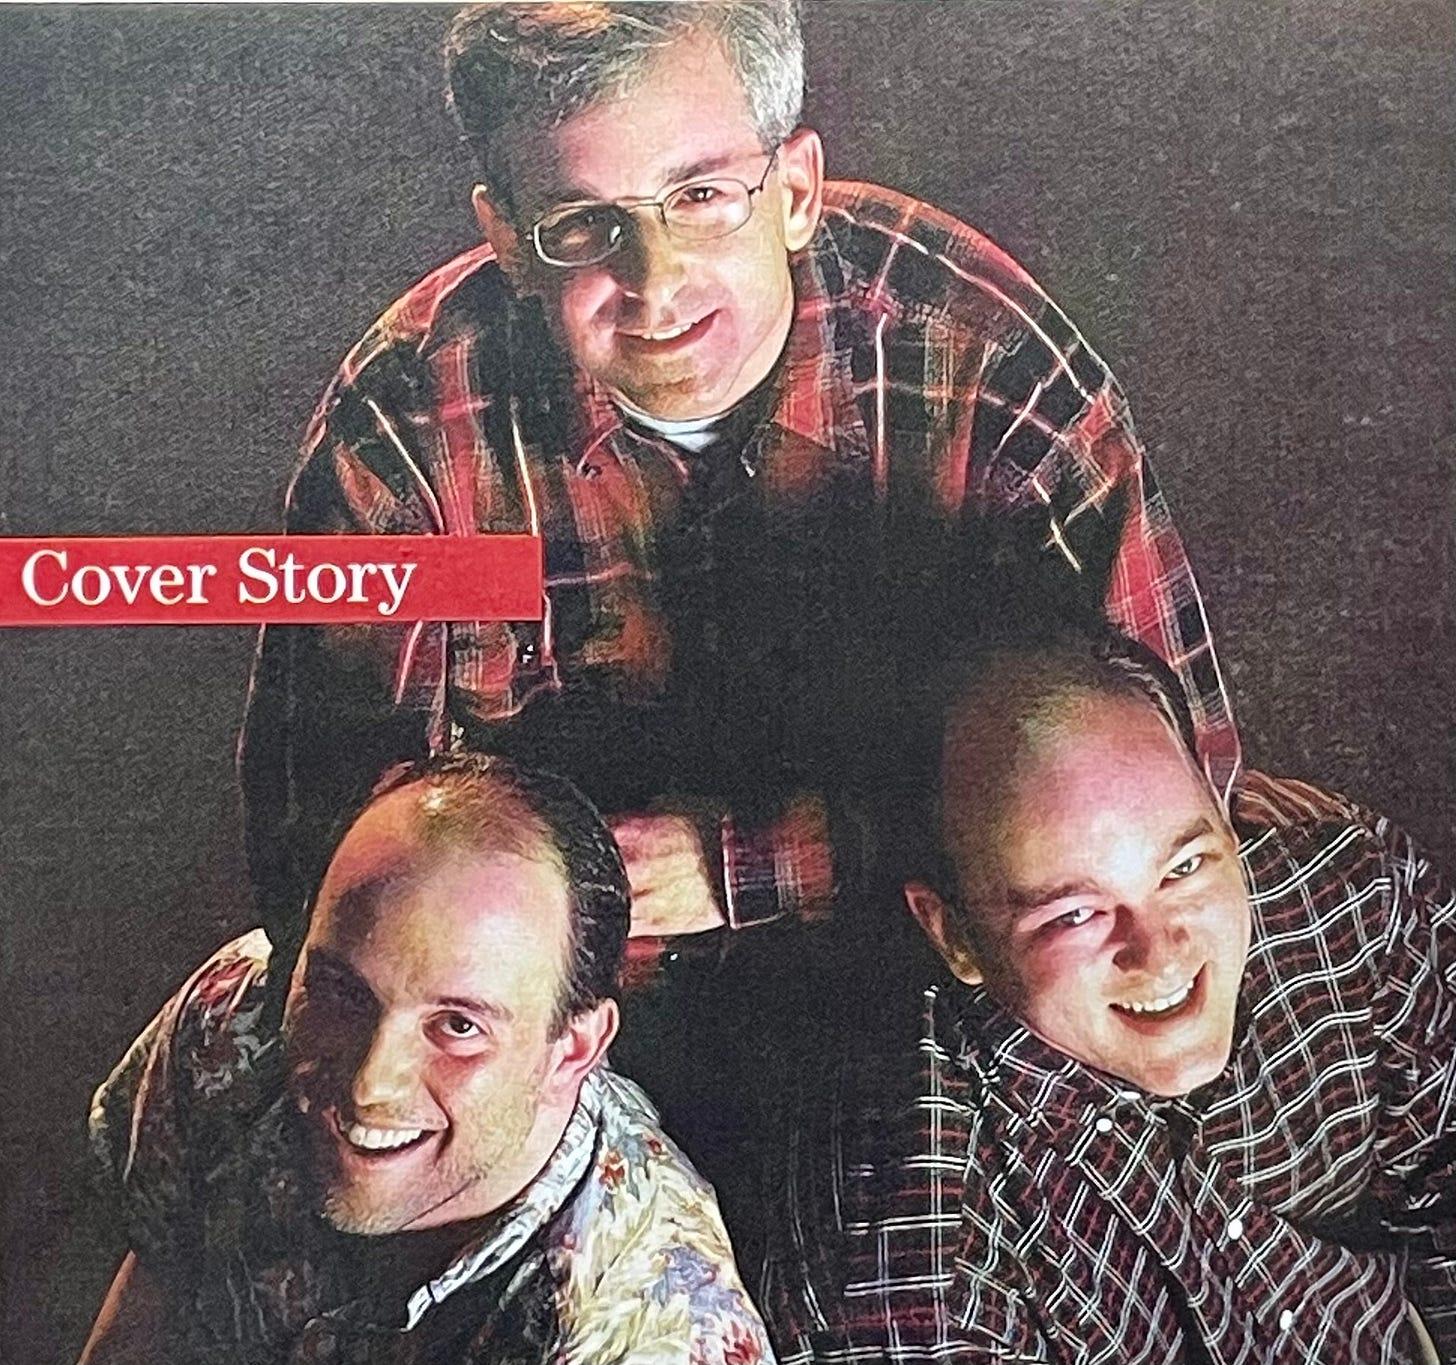 Photo of me, Ben Slivka, and J Allard.